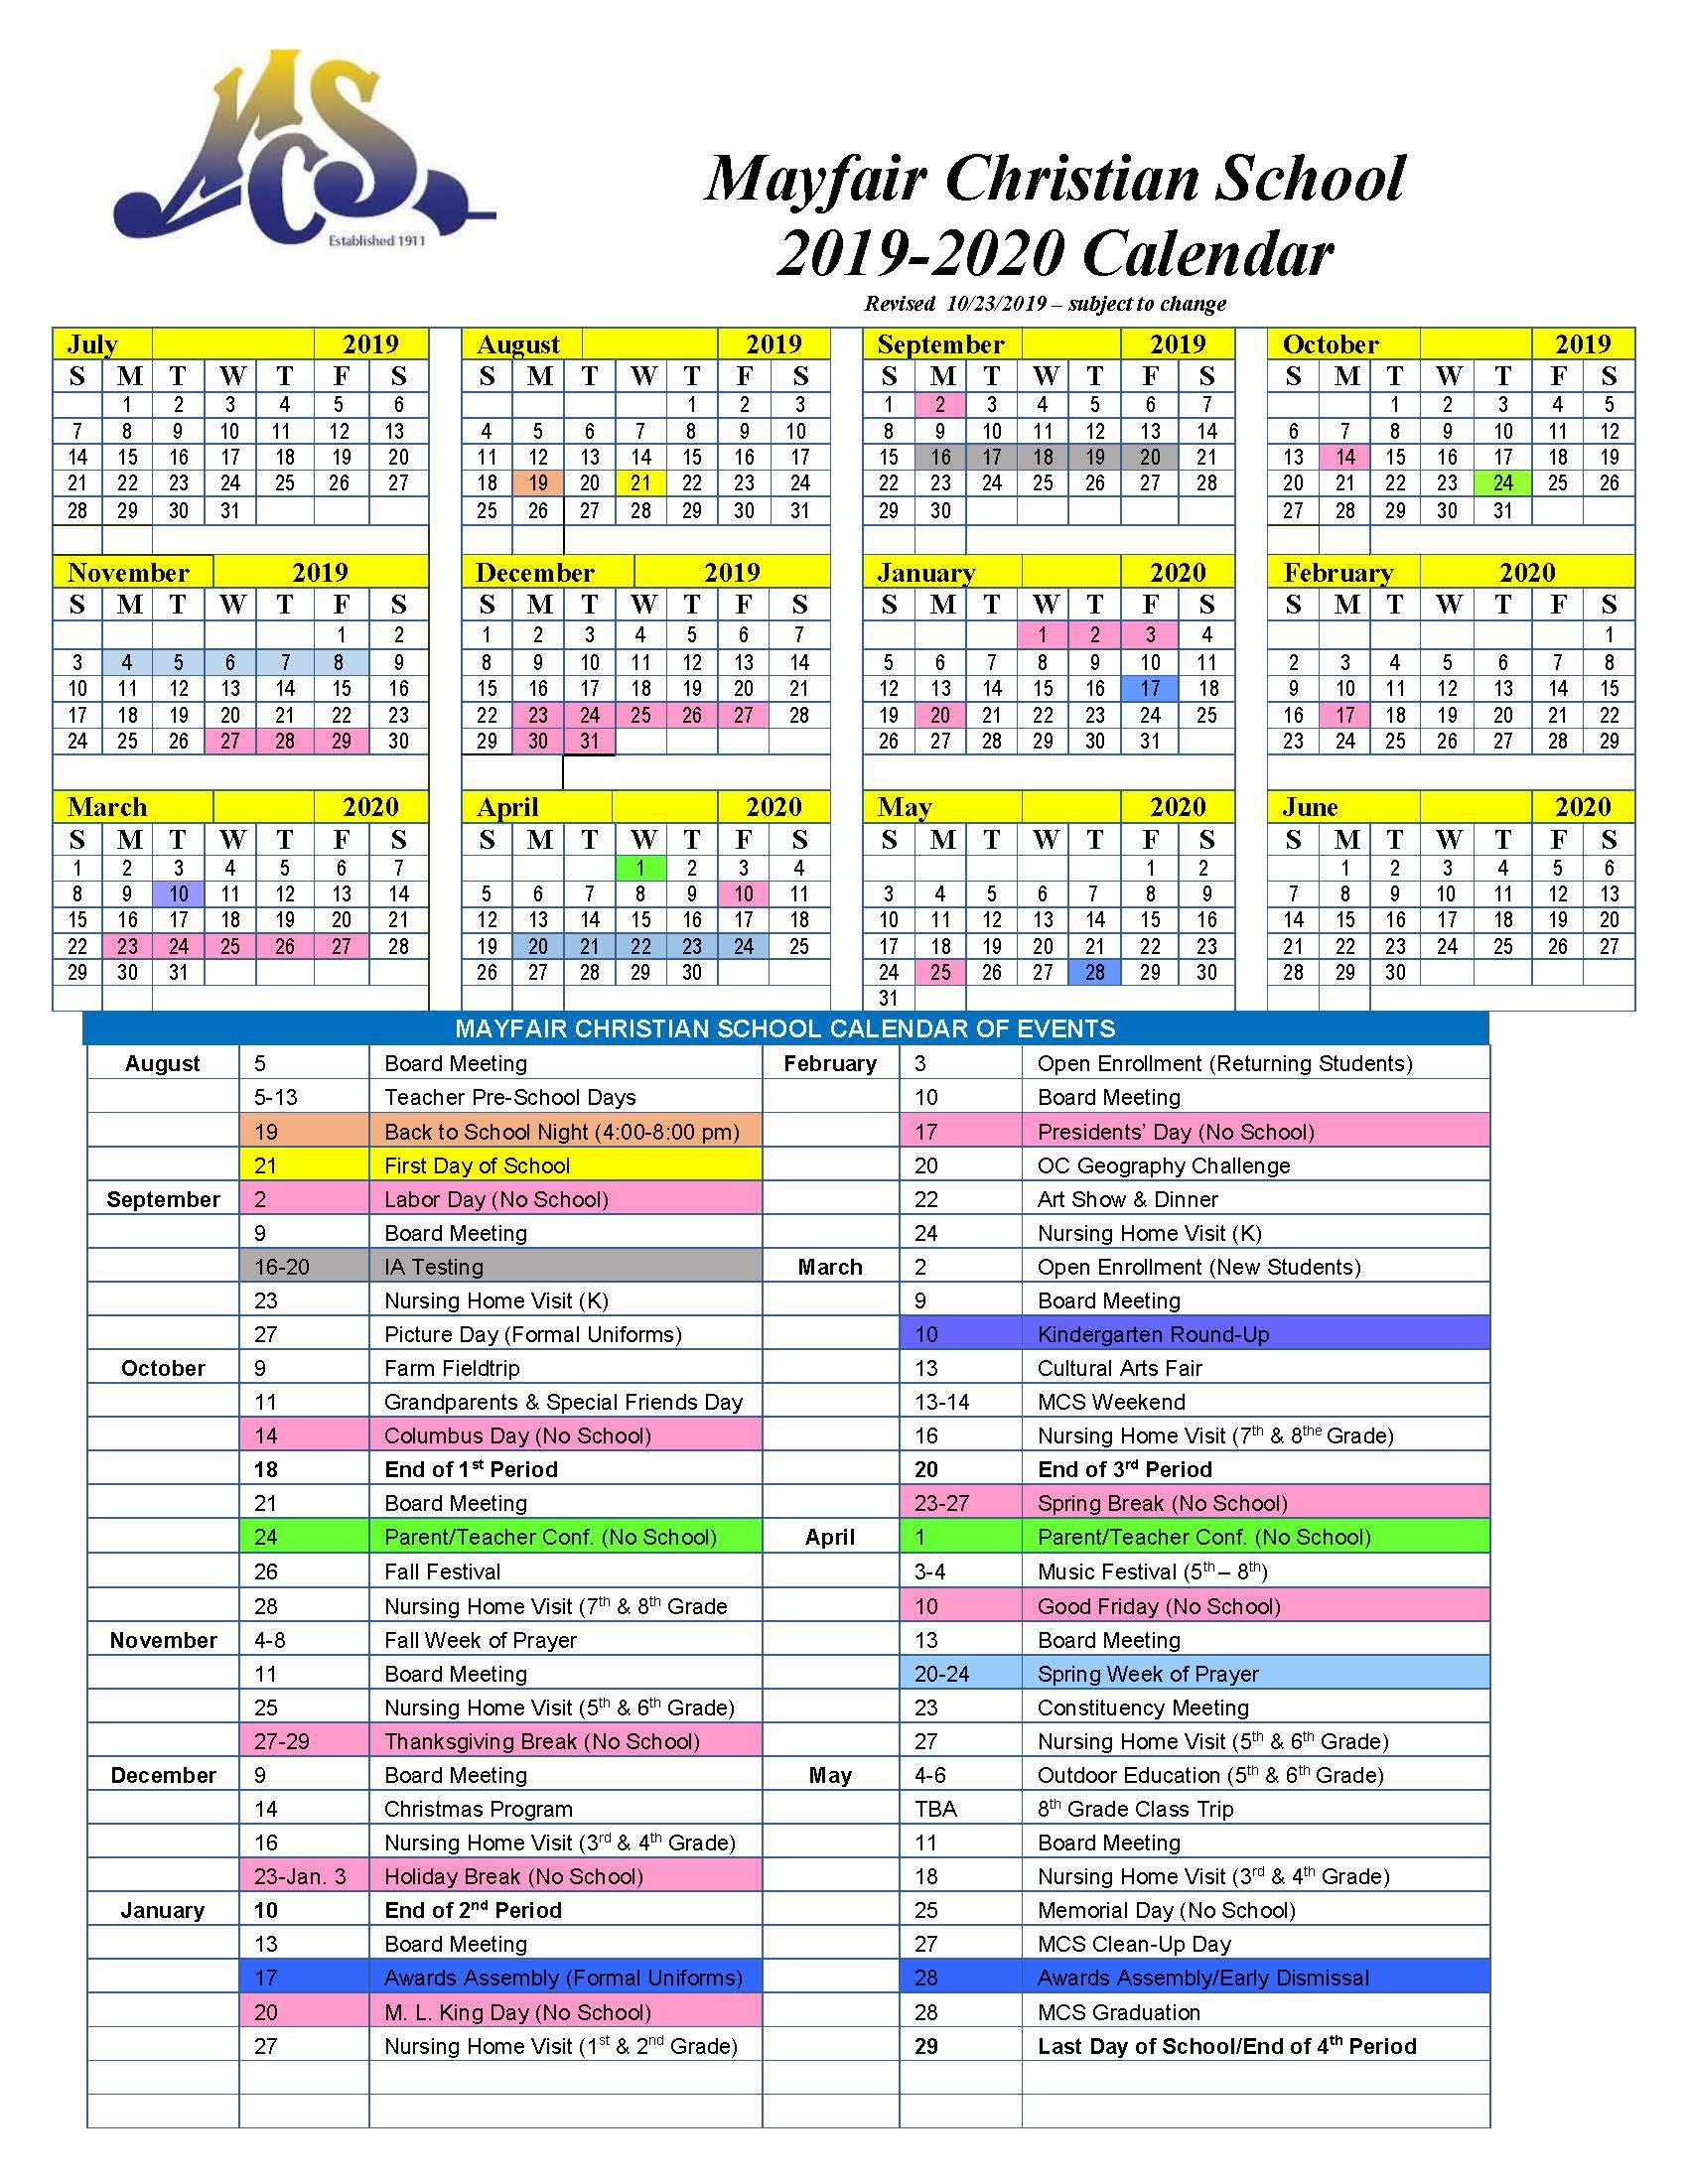 Calendar   Mayfair Christian School Within University Of Akron 2020 Calendar